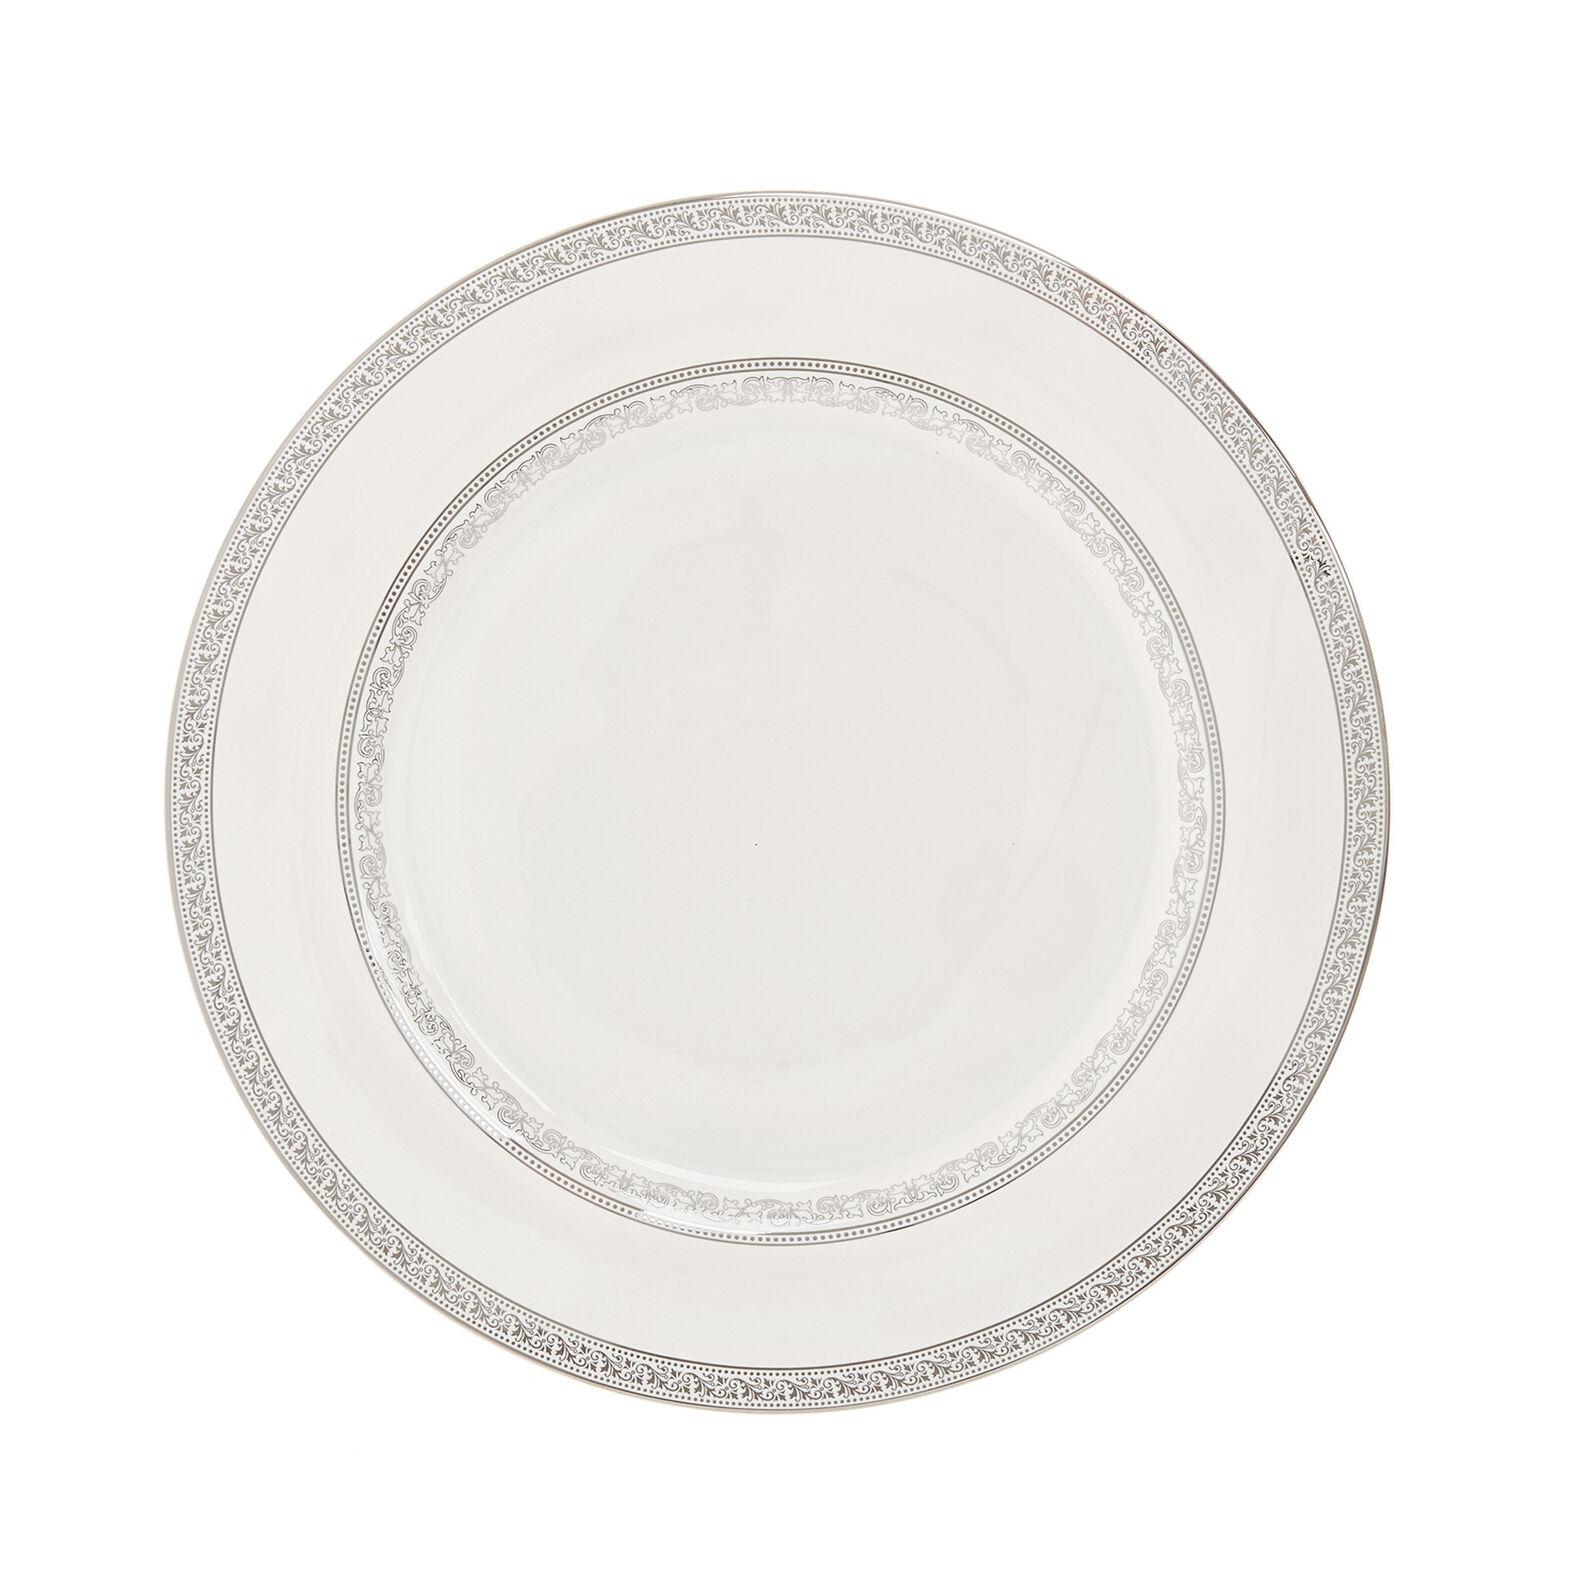 New bone China serving dish with decoration